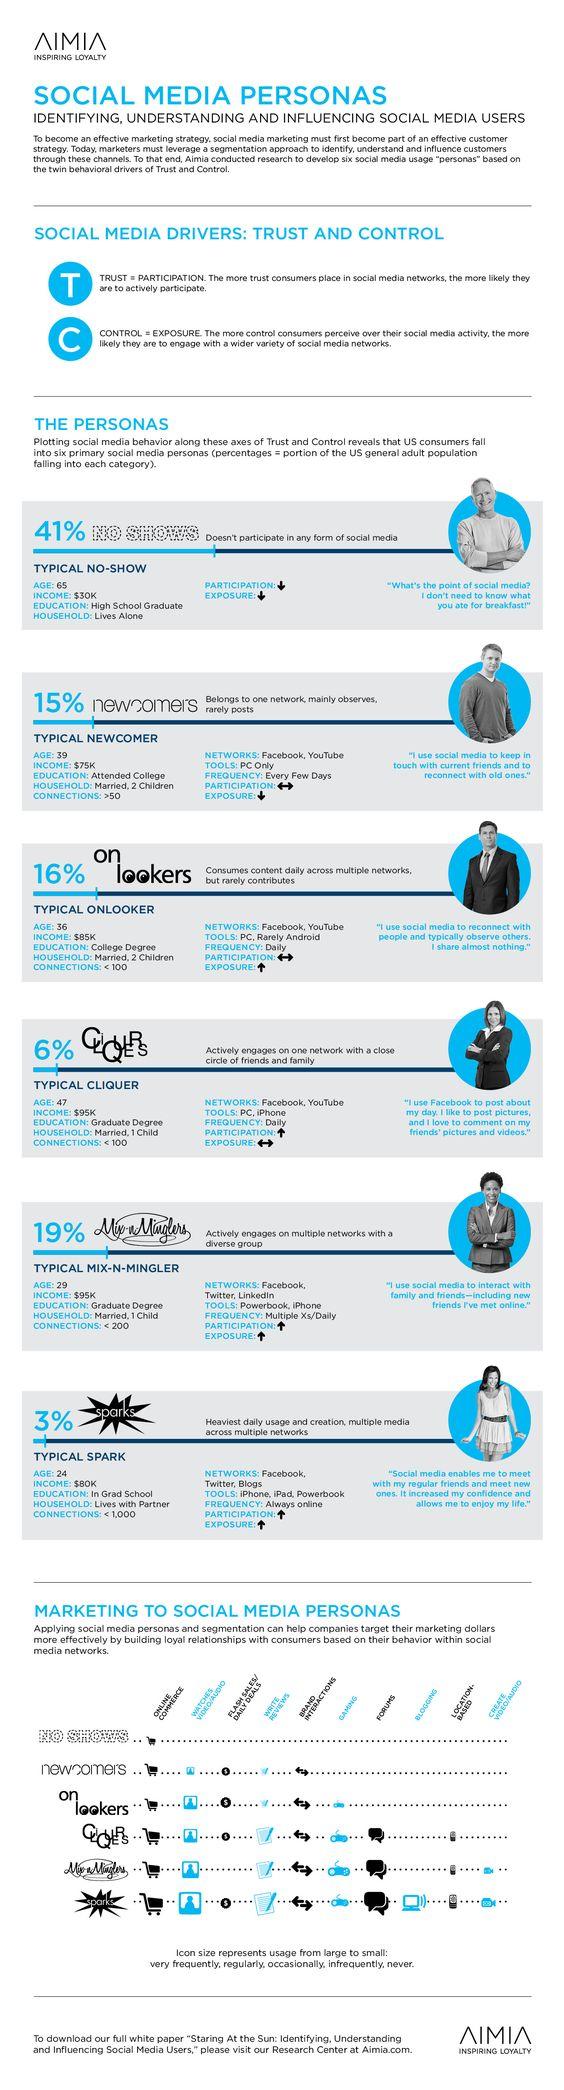 #INFOGRAPHIC: 6 Types of Social Media Users http://j.mp/MX3mel by @pamdyer - Segmentation may help explain #SMM audience behavior